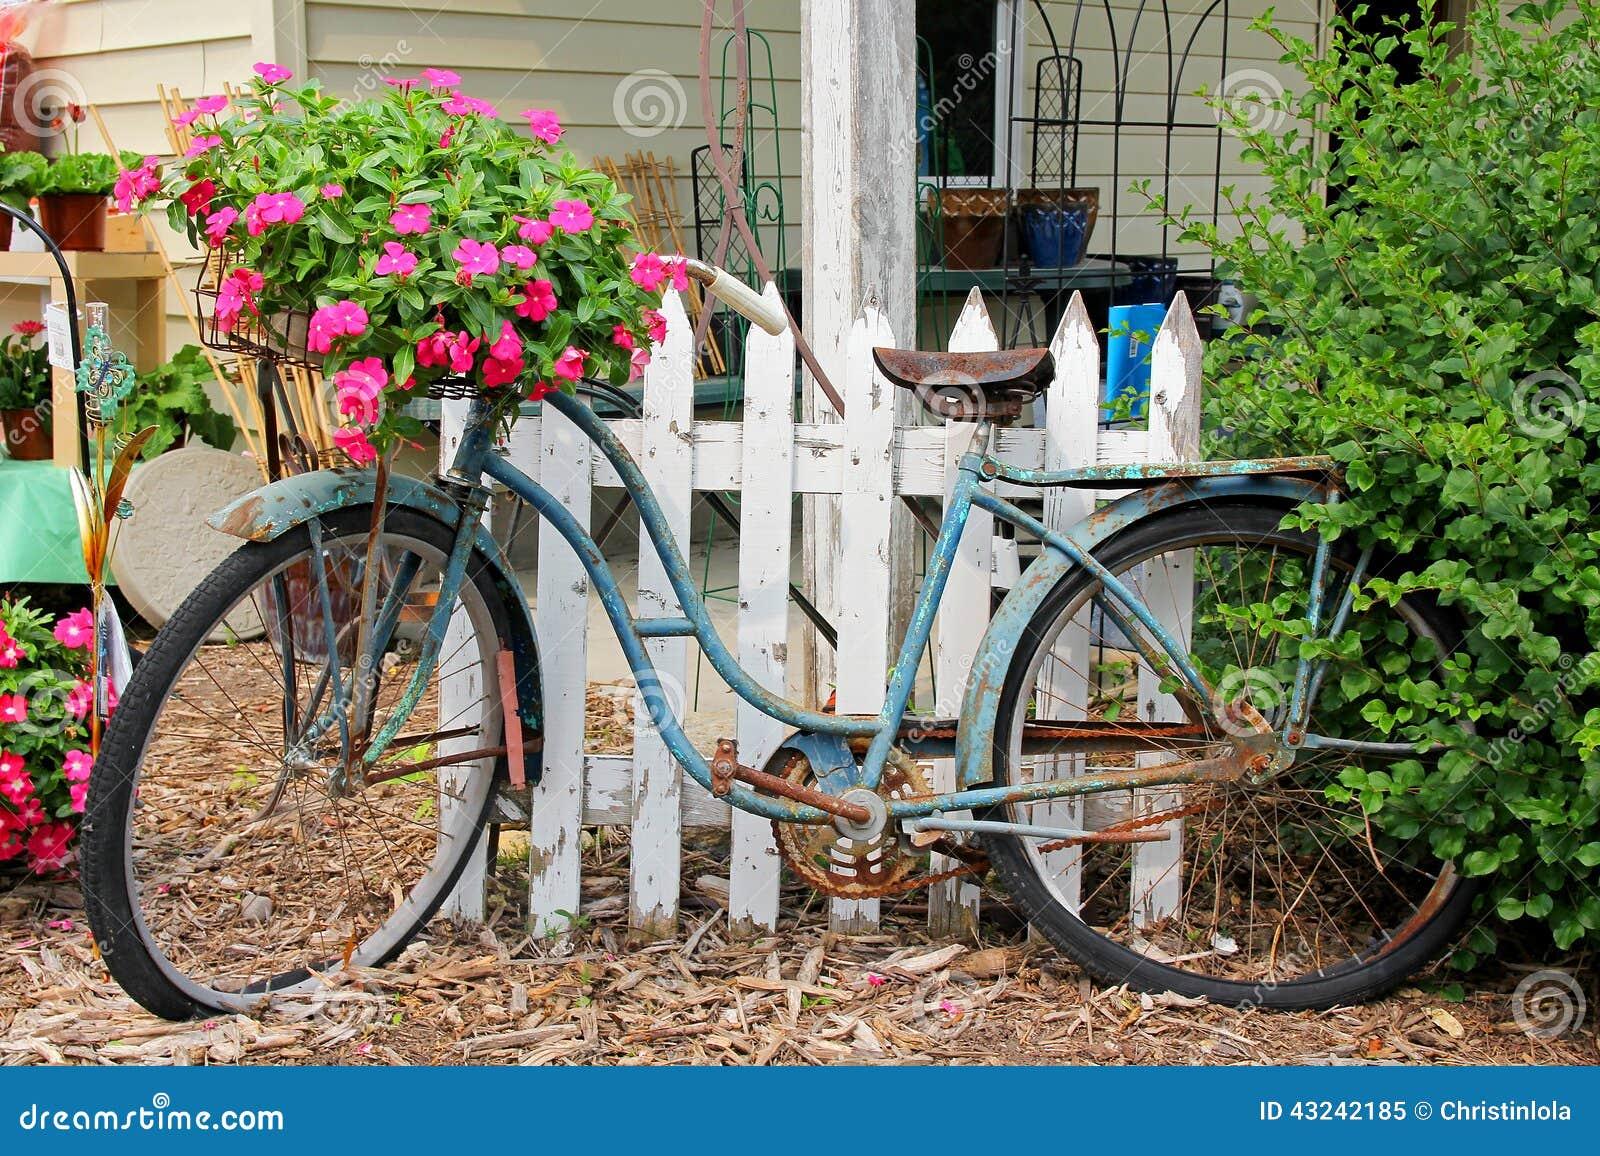 Rusty Old Vintage Bike Displayed In Flower Garden Stock